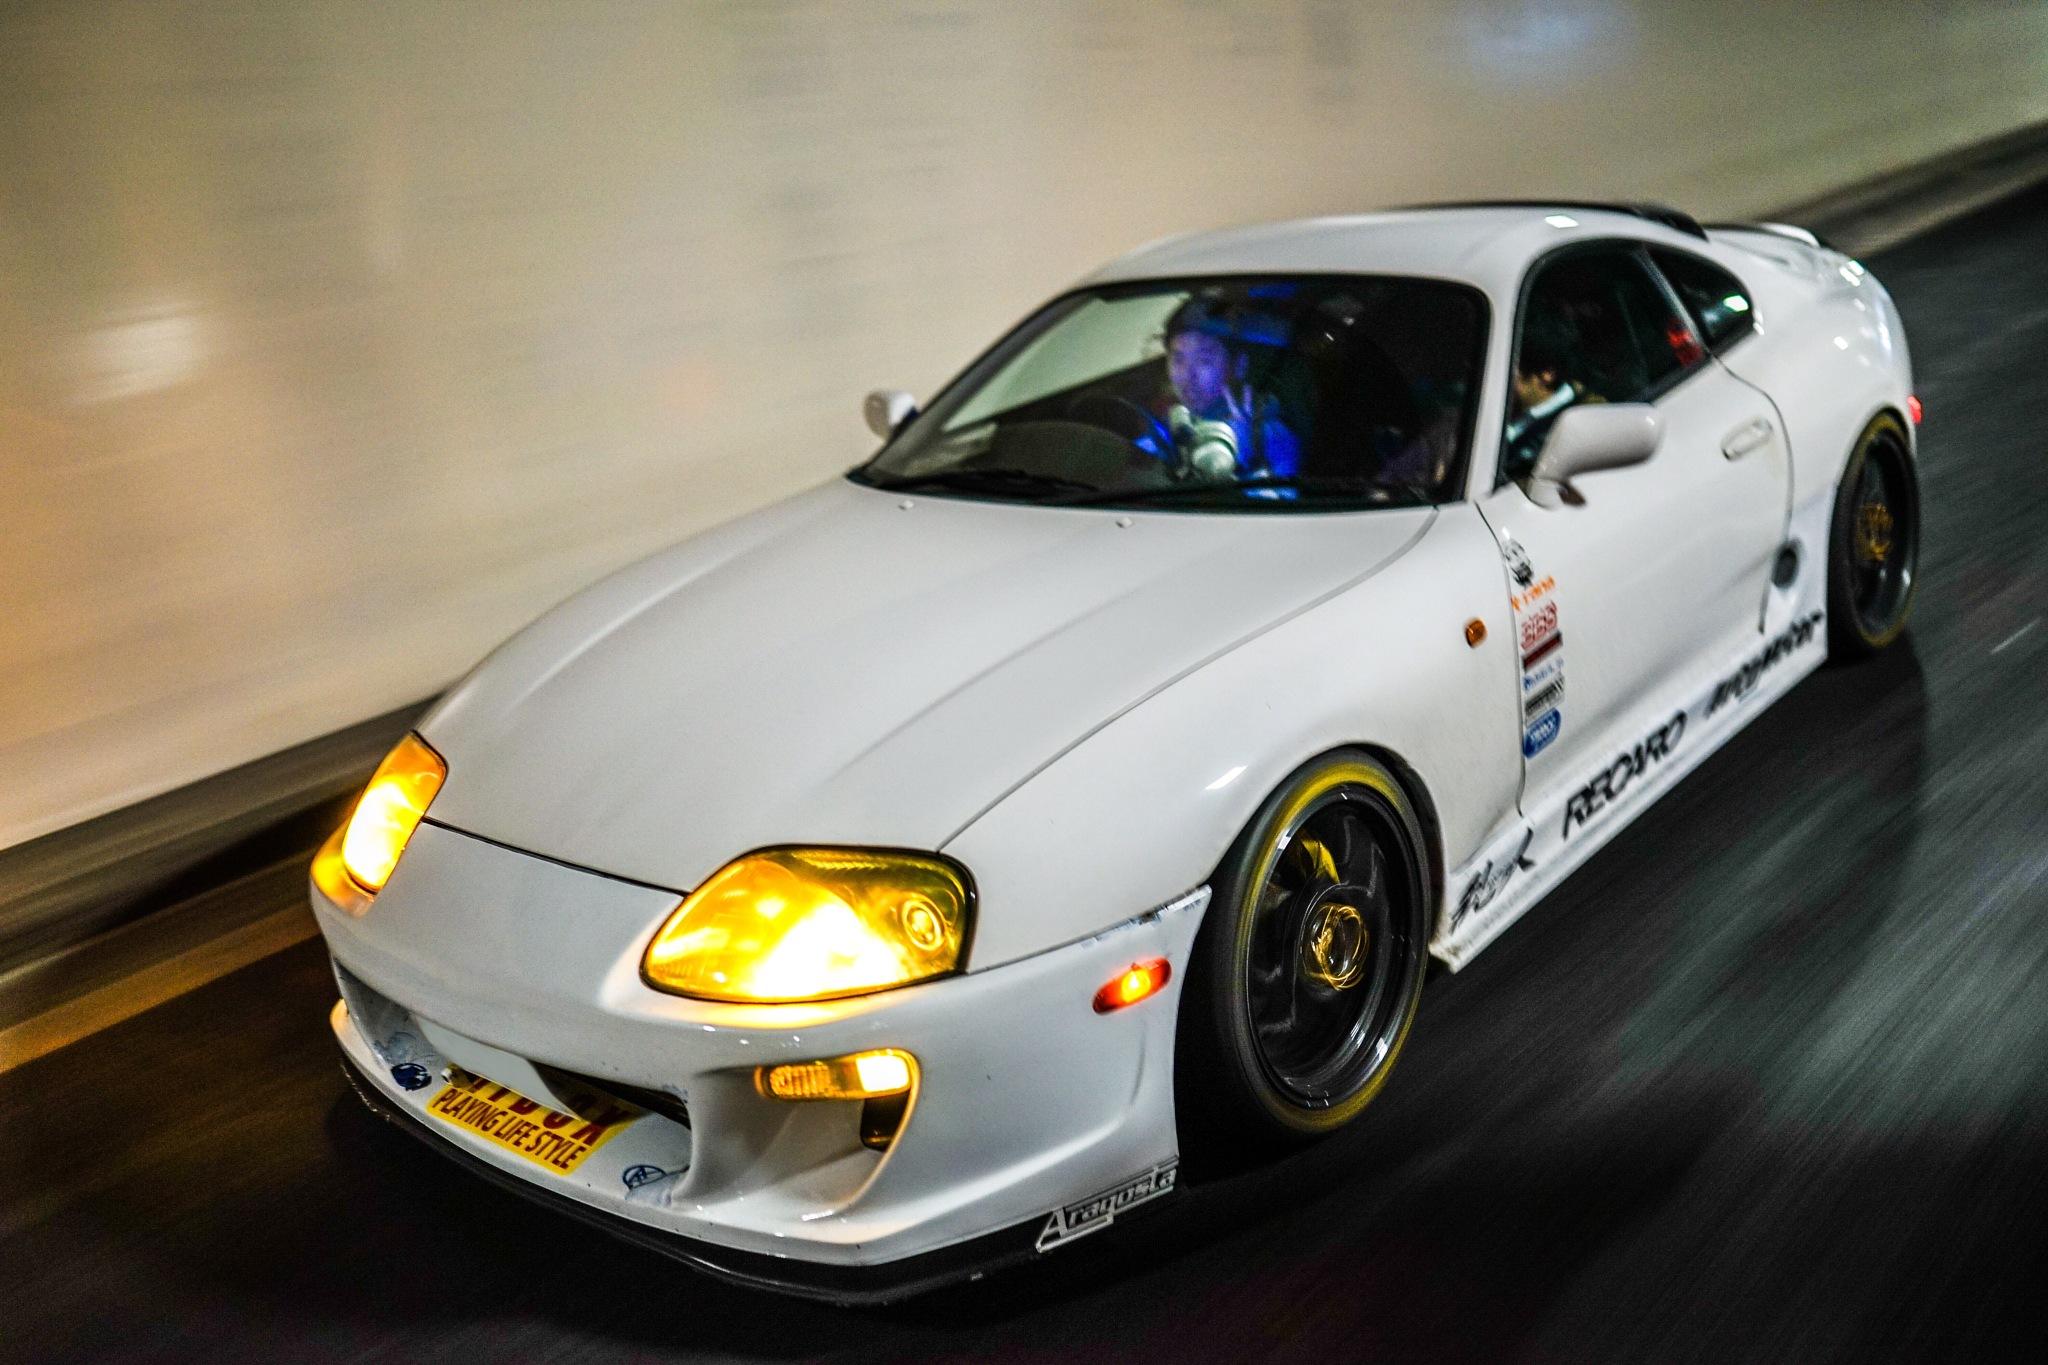 Toyota Supra by Taka1990